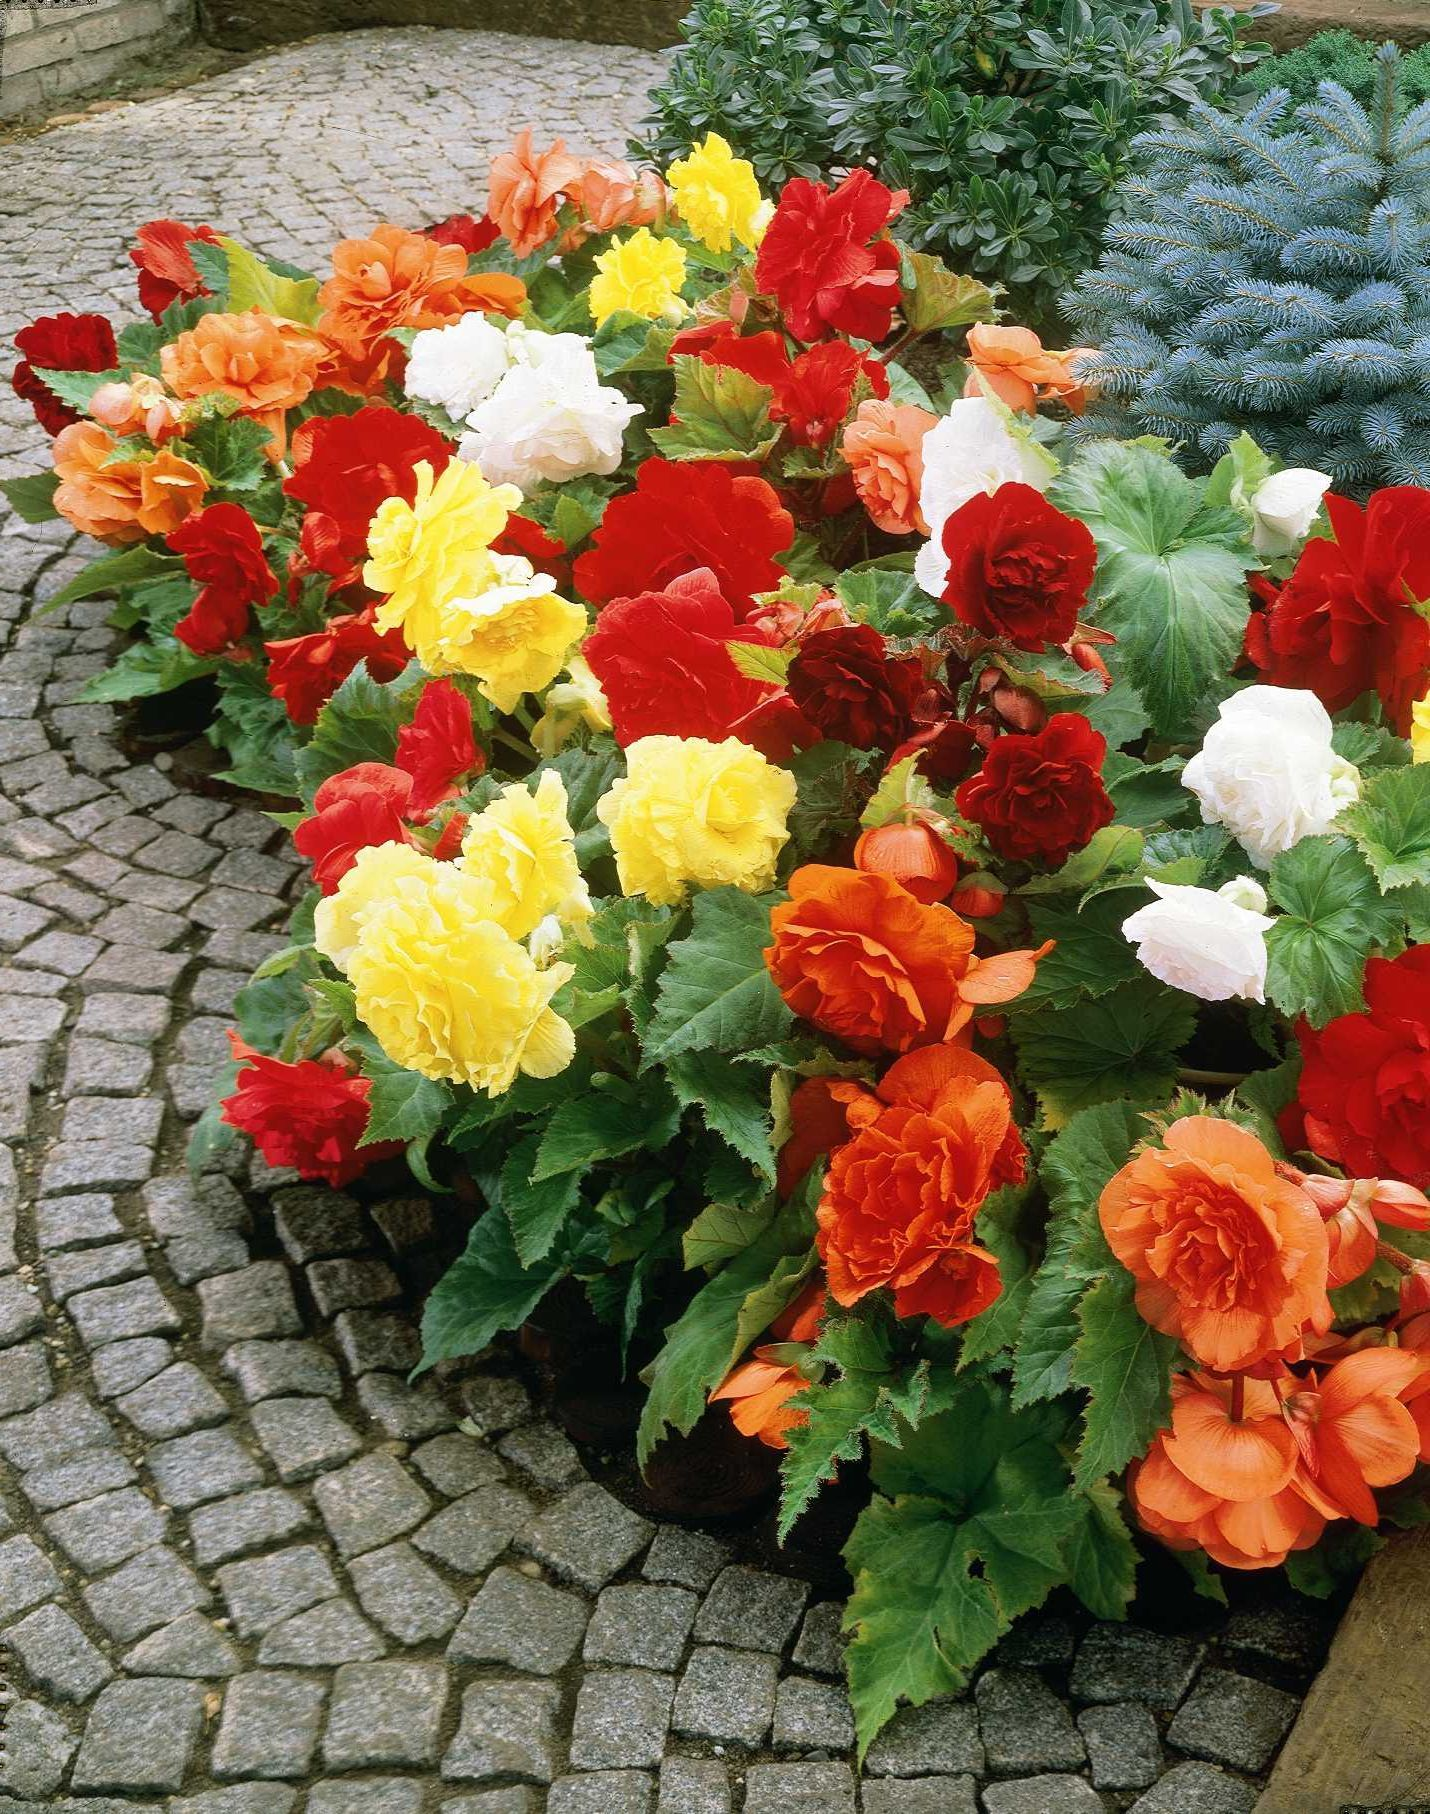 Planting Tuberous Begonias Garden Bulb Blog Flower Bulbs